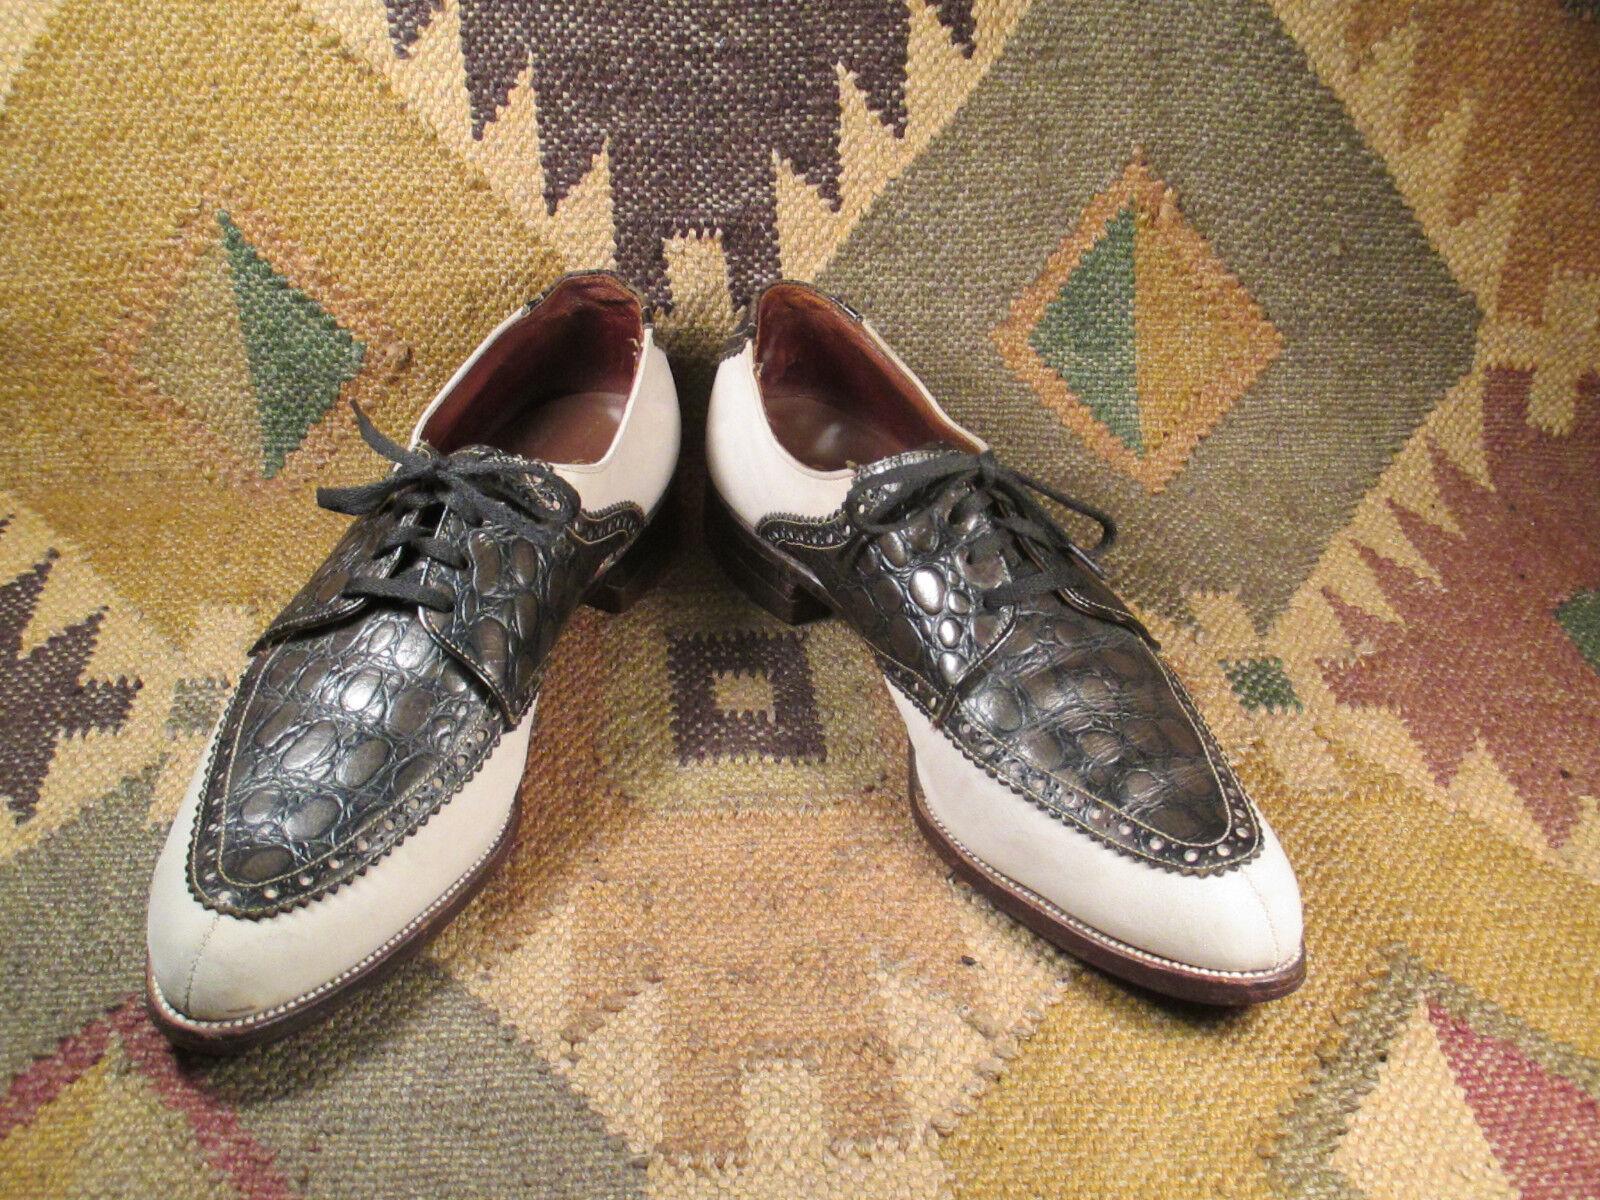 Scarpe casual da uomo  Rare Vintage Packard Nubuck Leather Shoes Sz 8.5 B/D